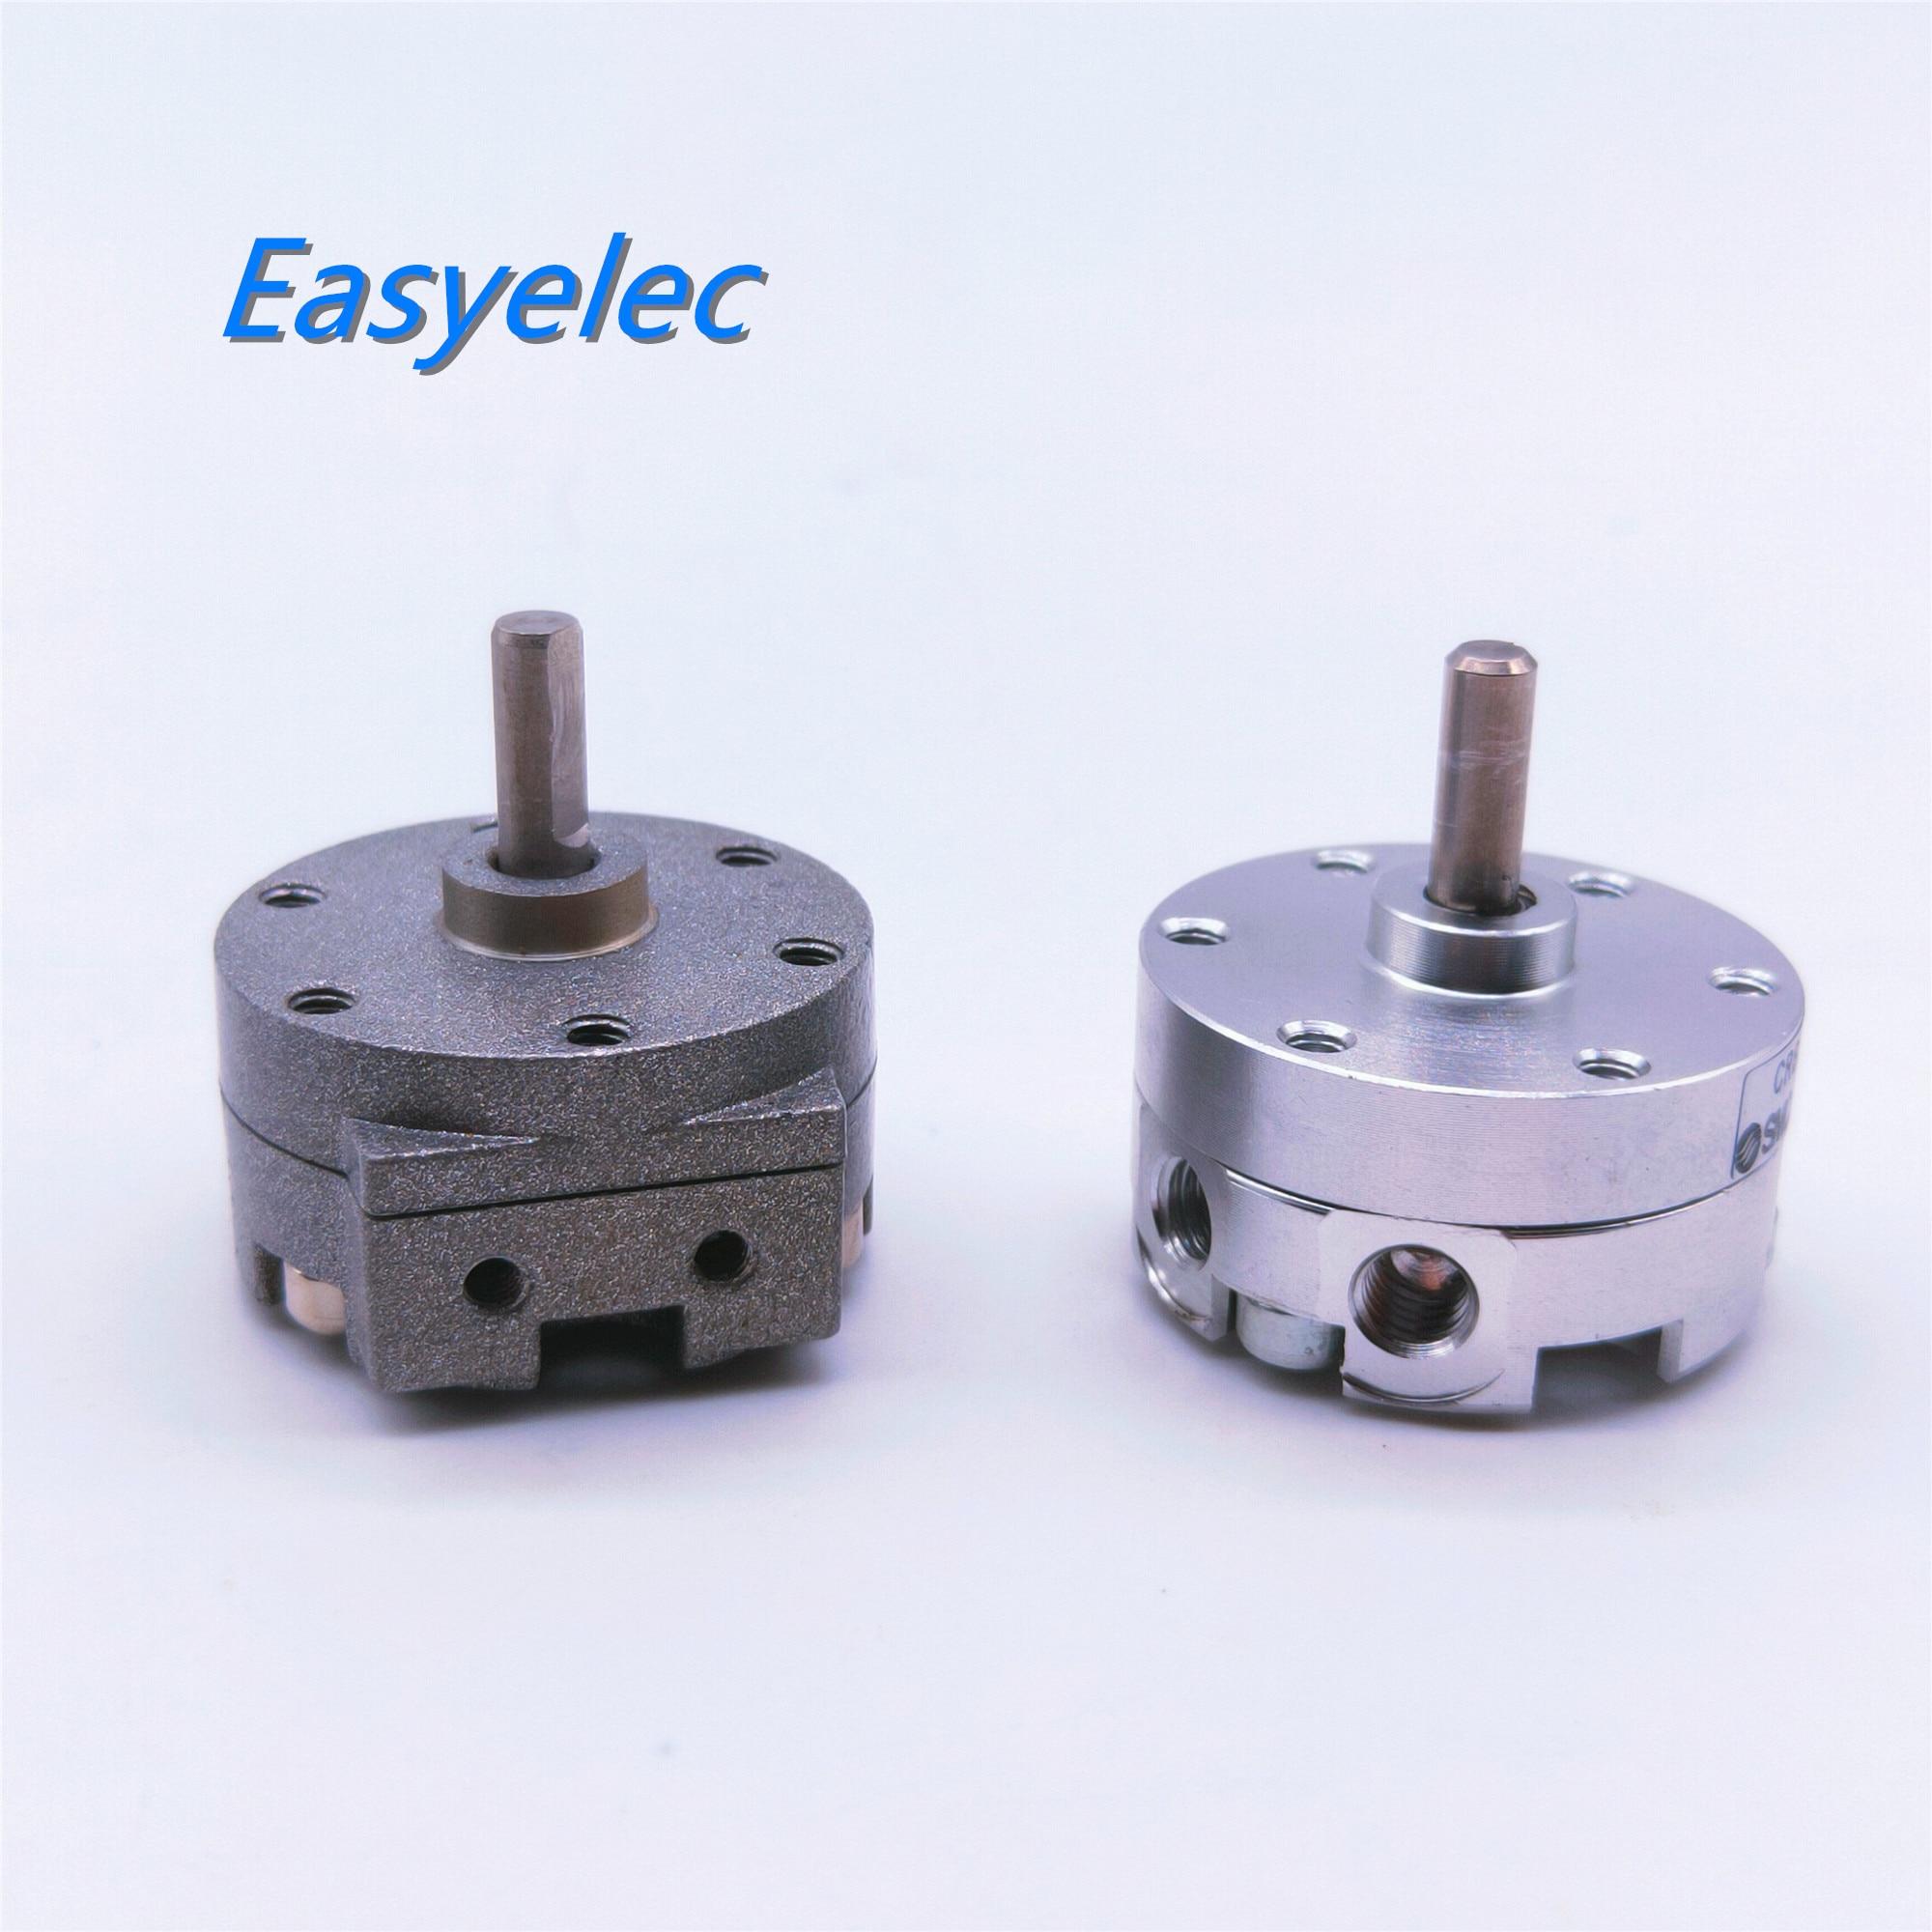 Actuador rotativo tipo SMC CRB2BW15-270S Actuador neumático rotativo cilindro rotativo